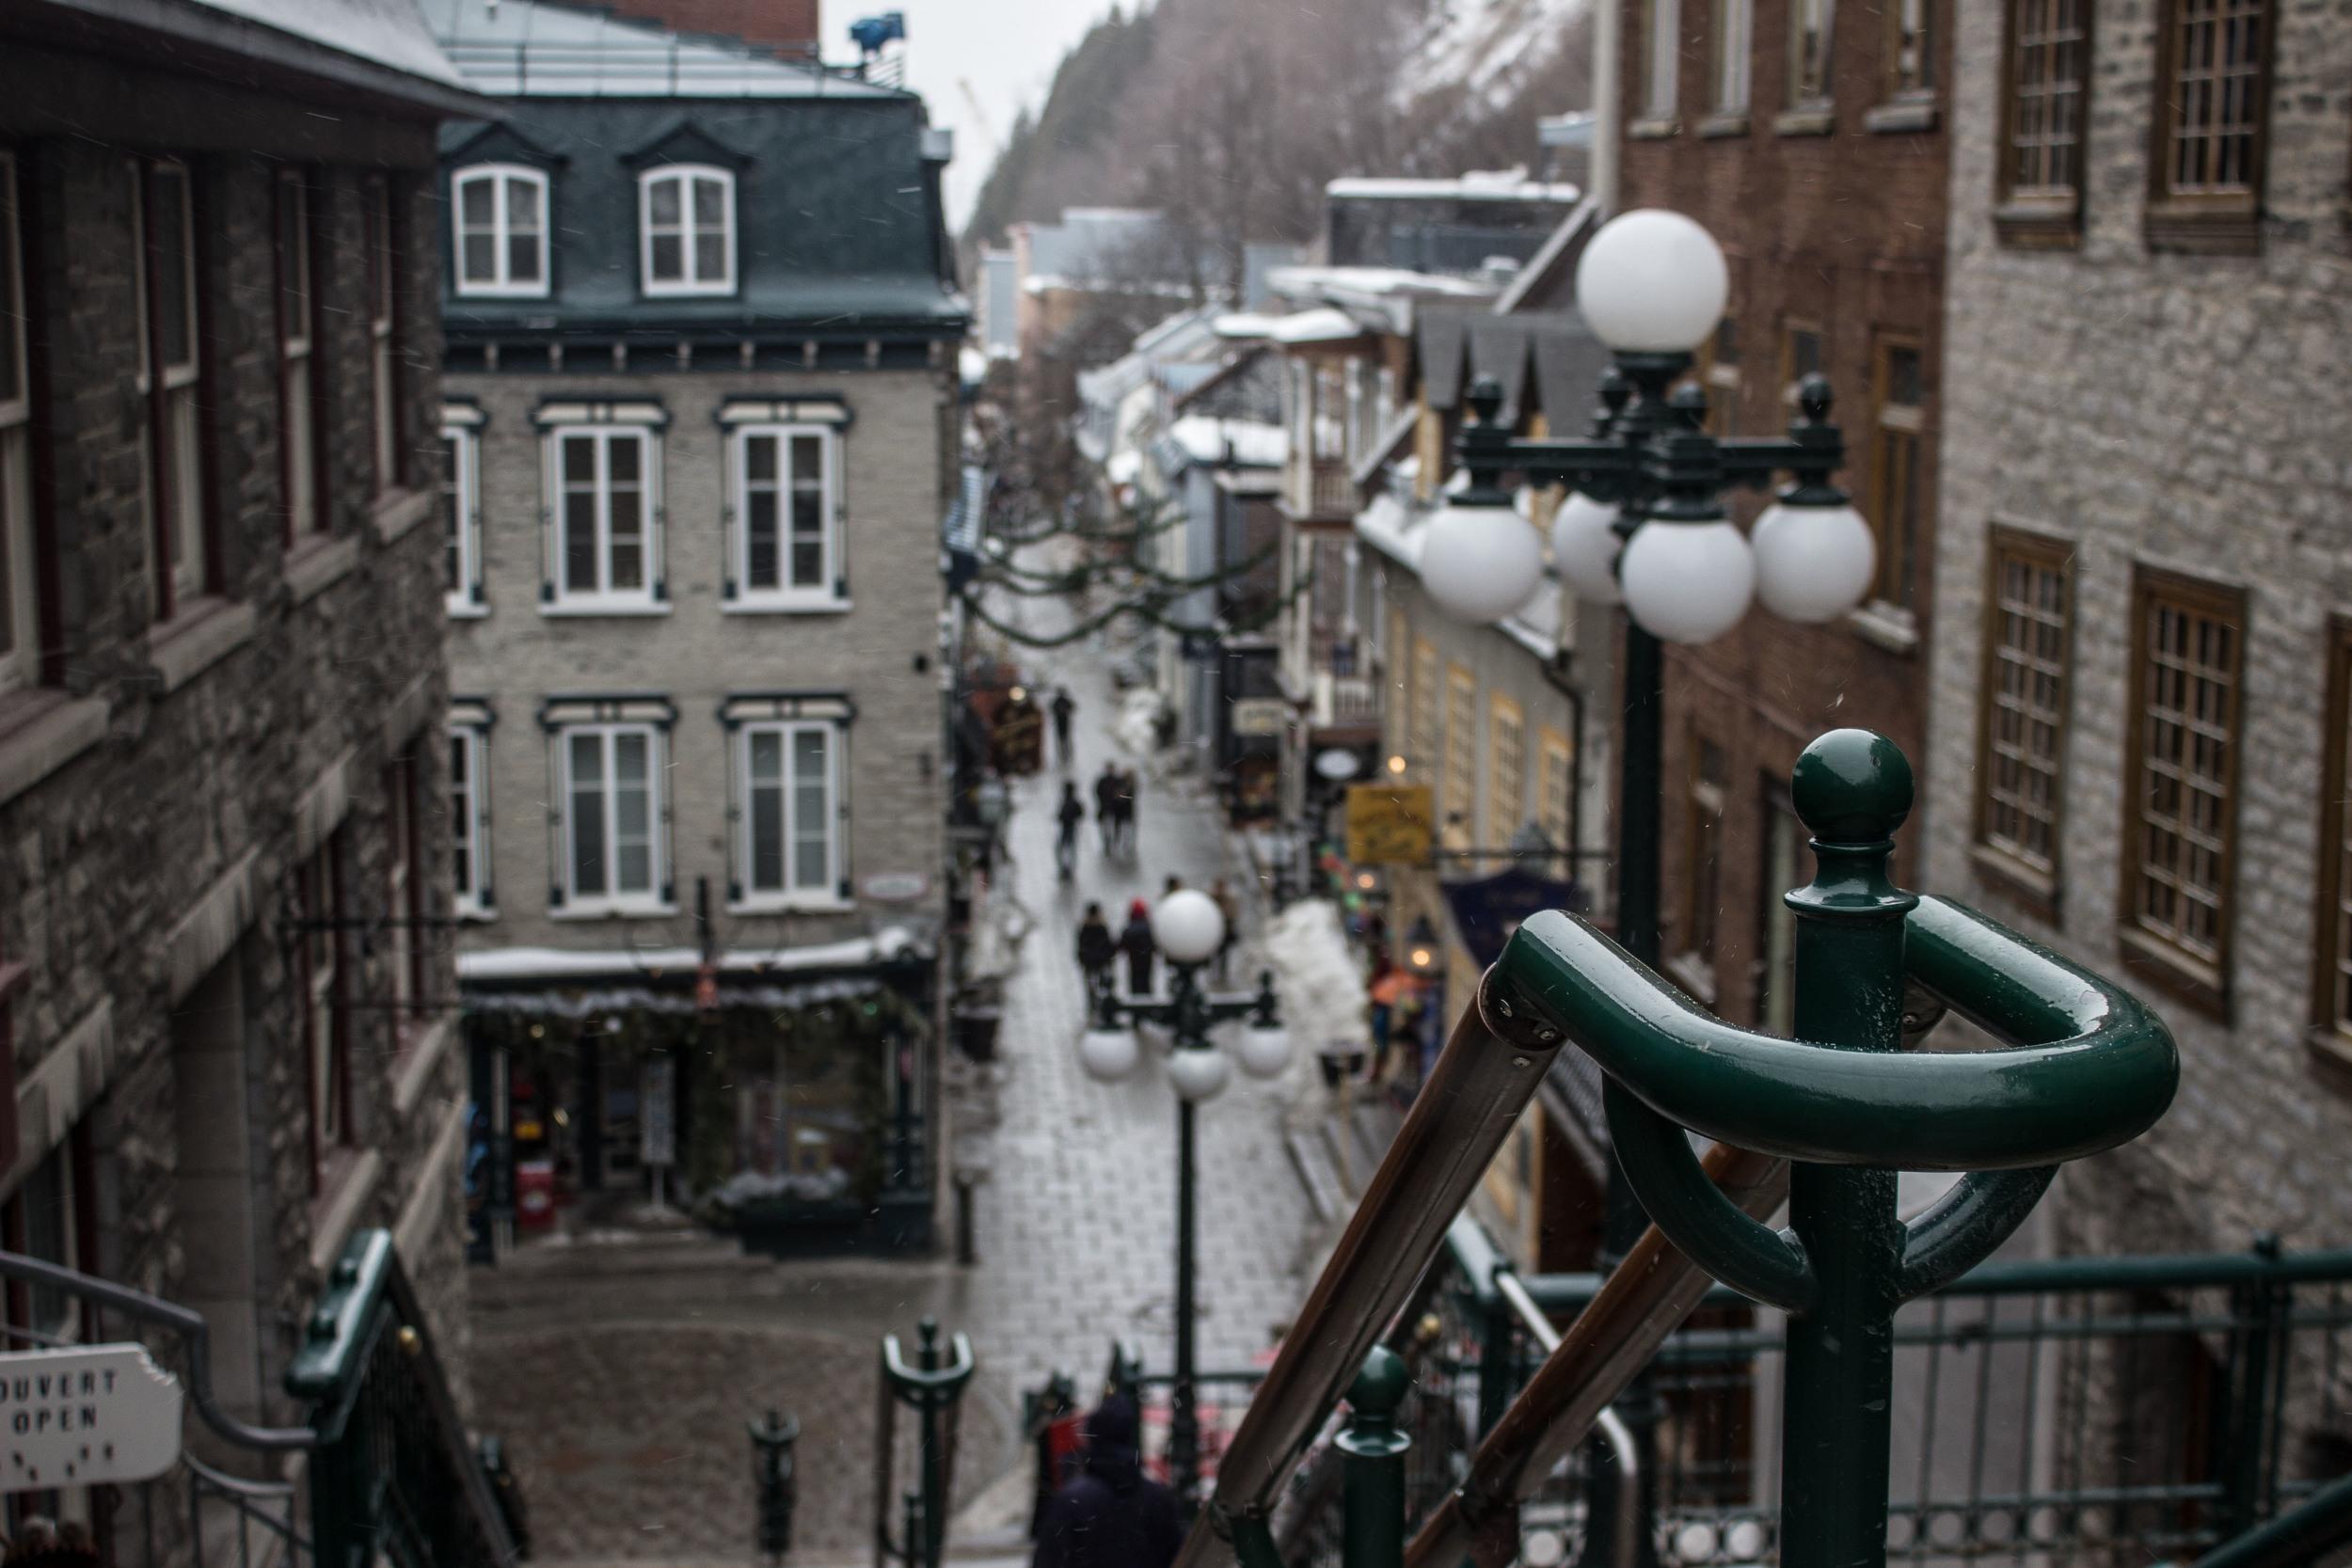 Quebec_140315_0038.jpg